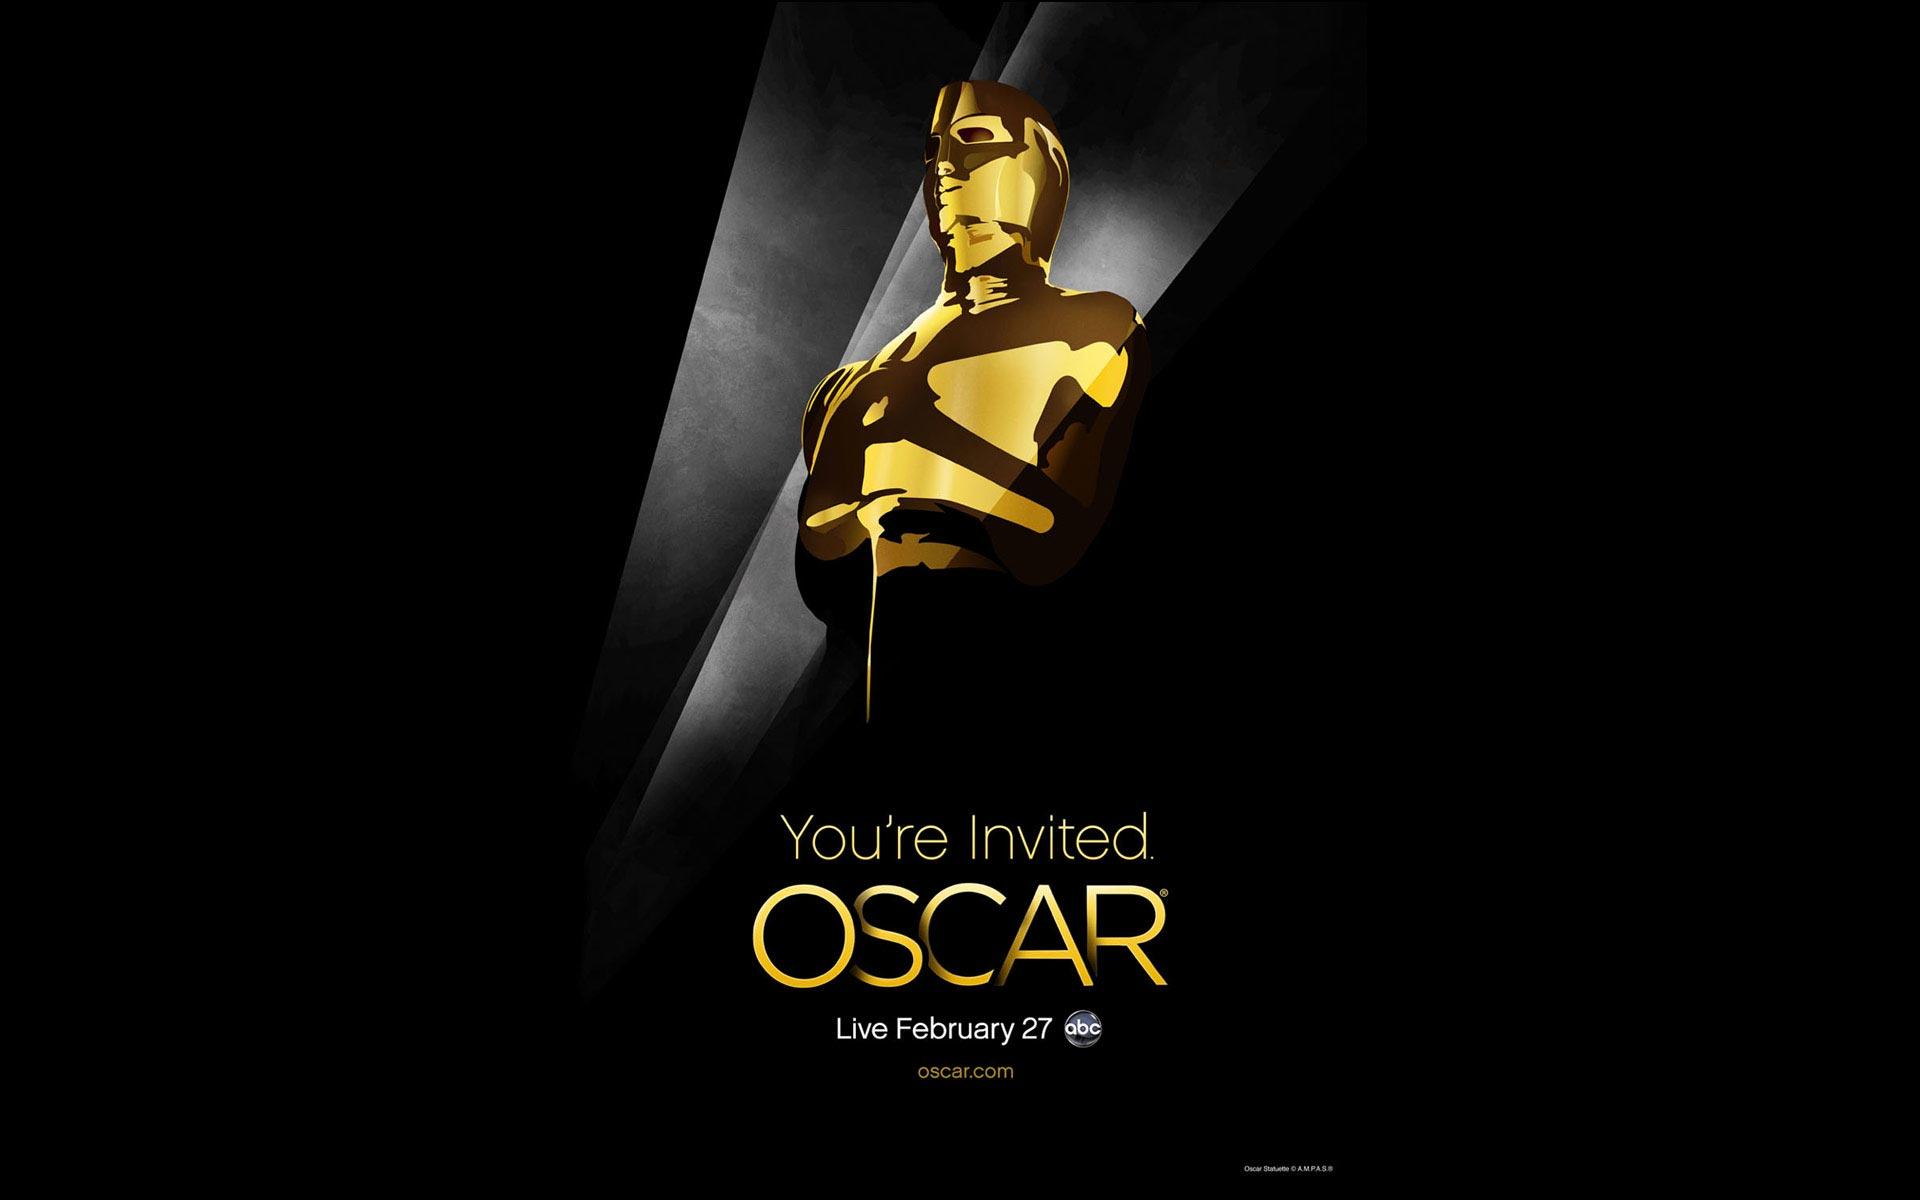 Oscar 2011 Poster